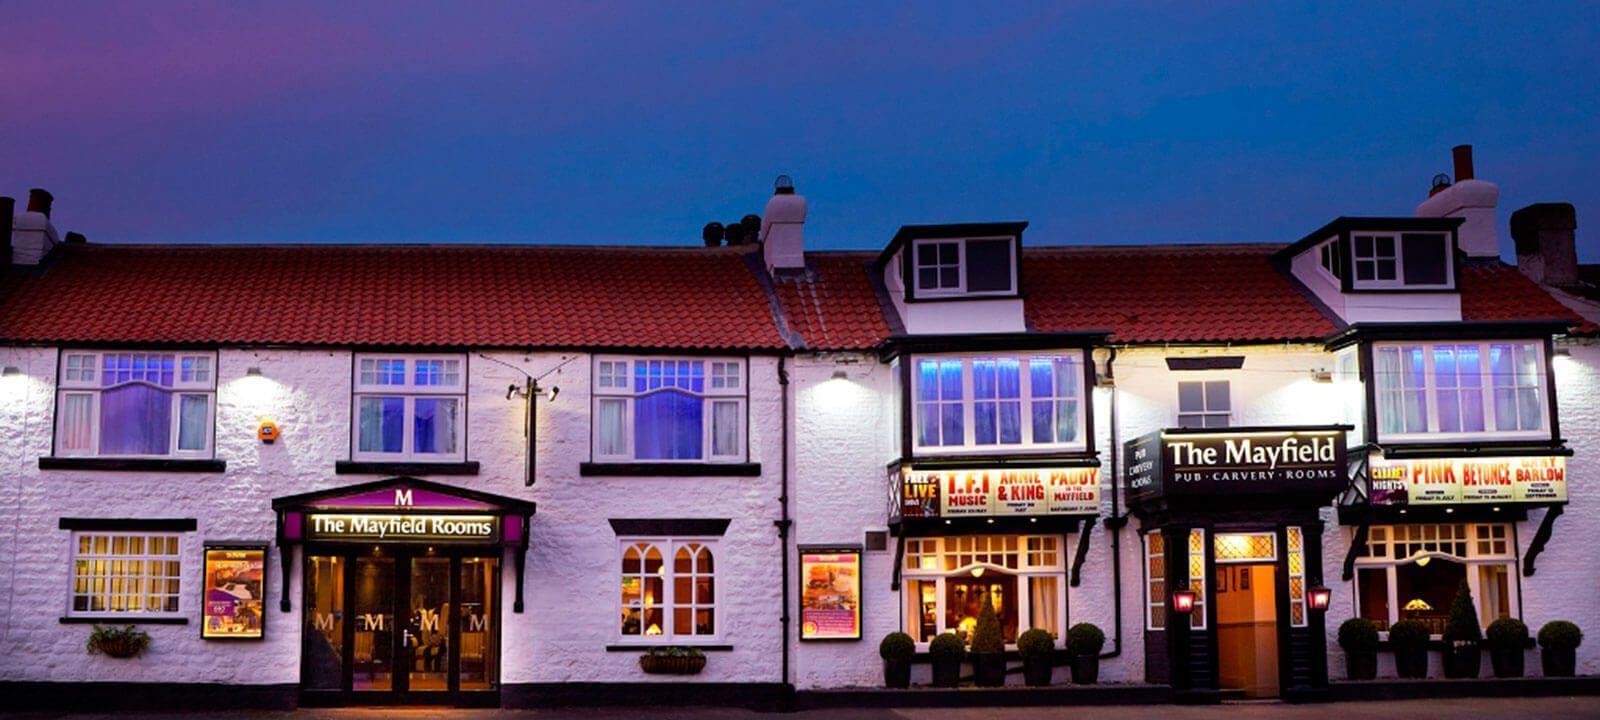 The Mayfield Hotel & Pub